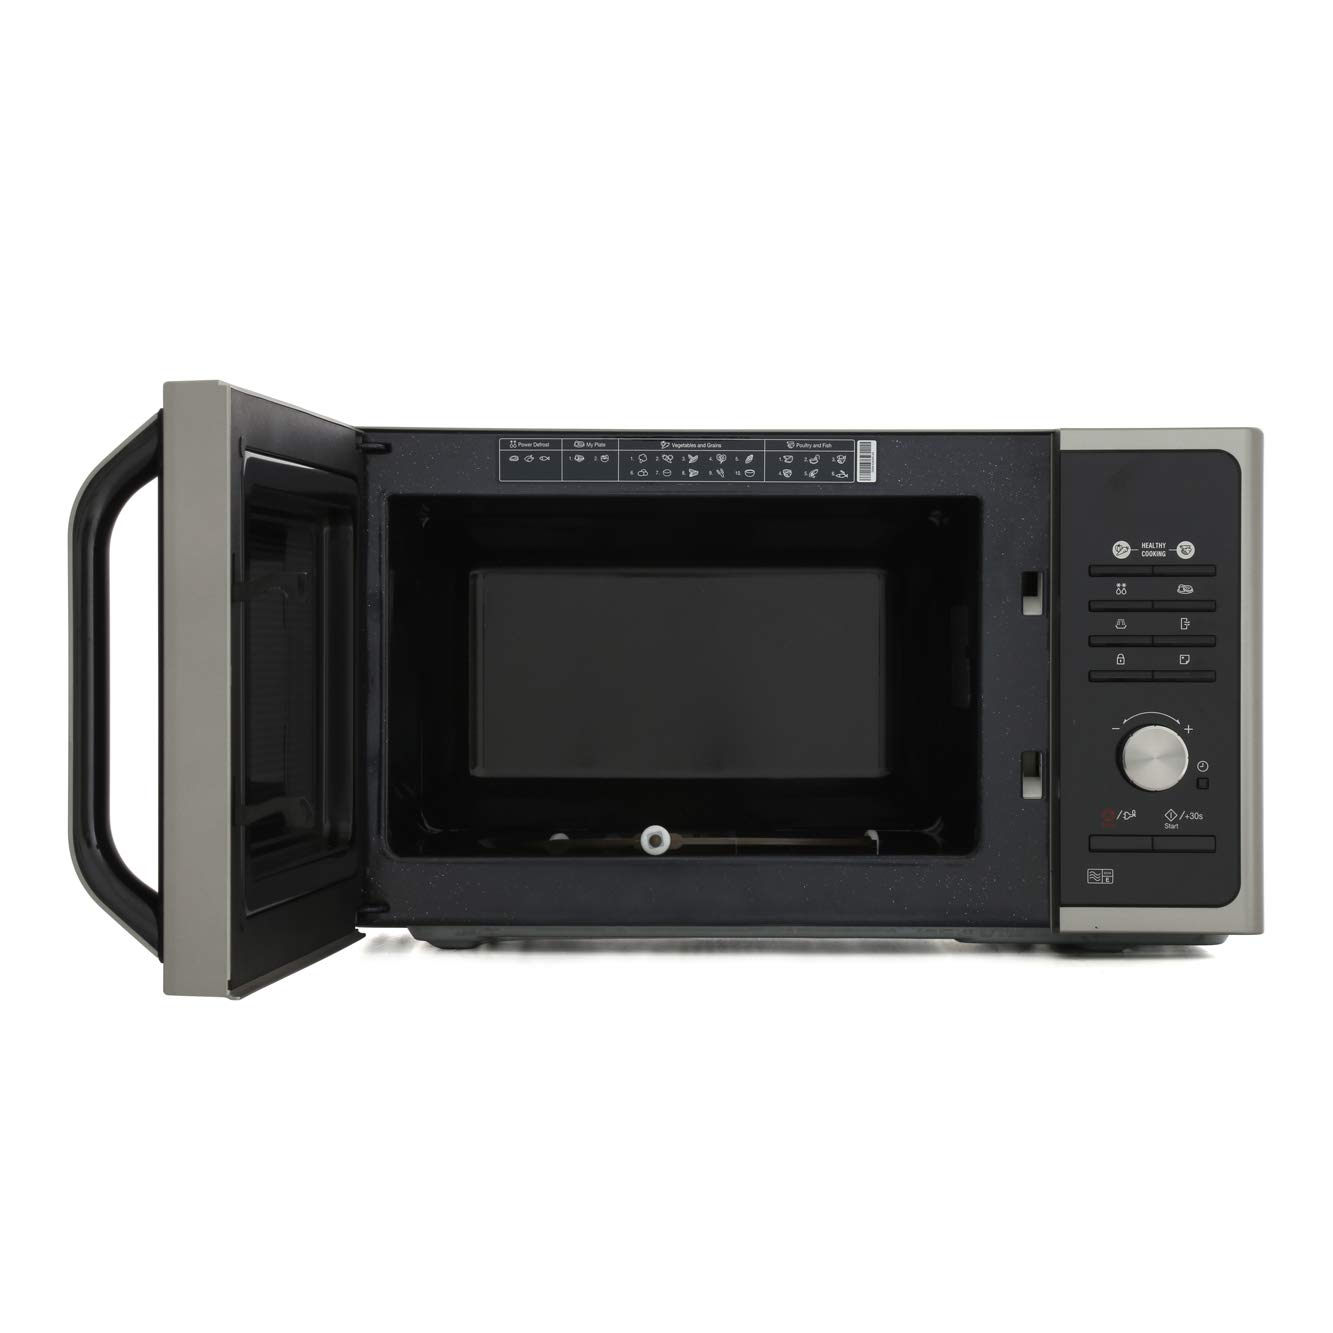 Samsung ms23 F301tas 50 cm Stand Microondas: Amazon.es ...